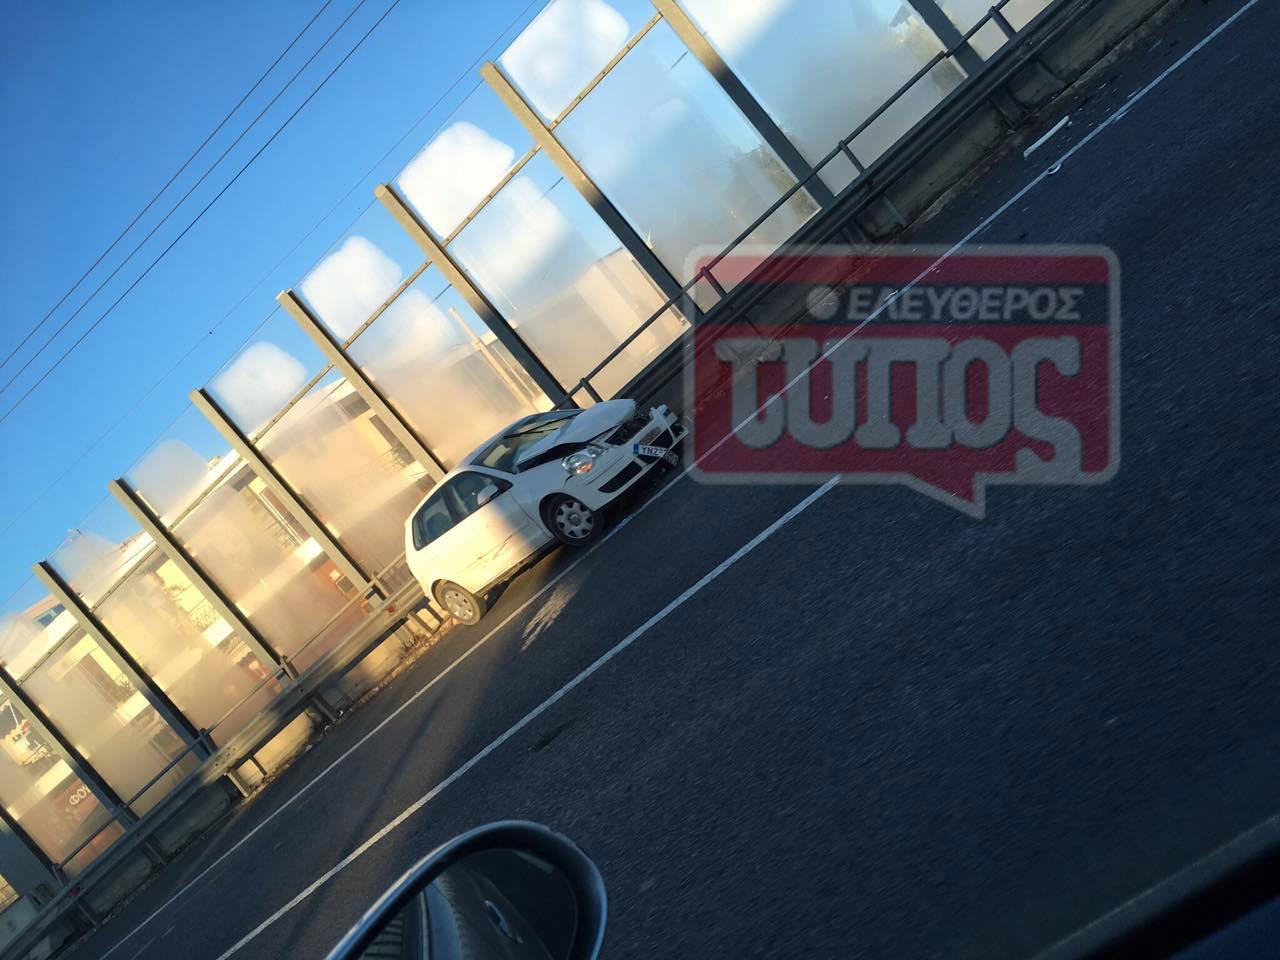 t5roxaio-ethinik-odos-traumaties-1300-1 Ατύχημα με τραυματία στην εθνική οδό: Μποτιλιάρισμα με ουρές χιλιομέτρων [εικόνες]